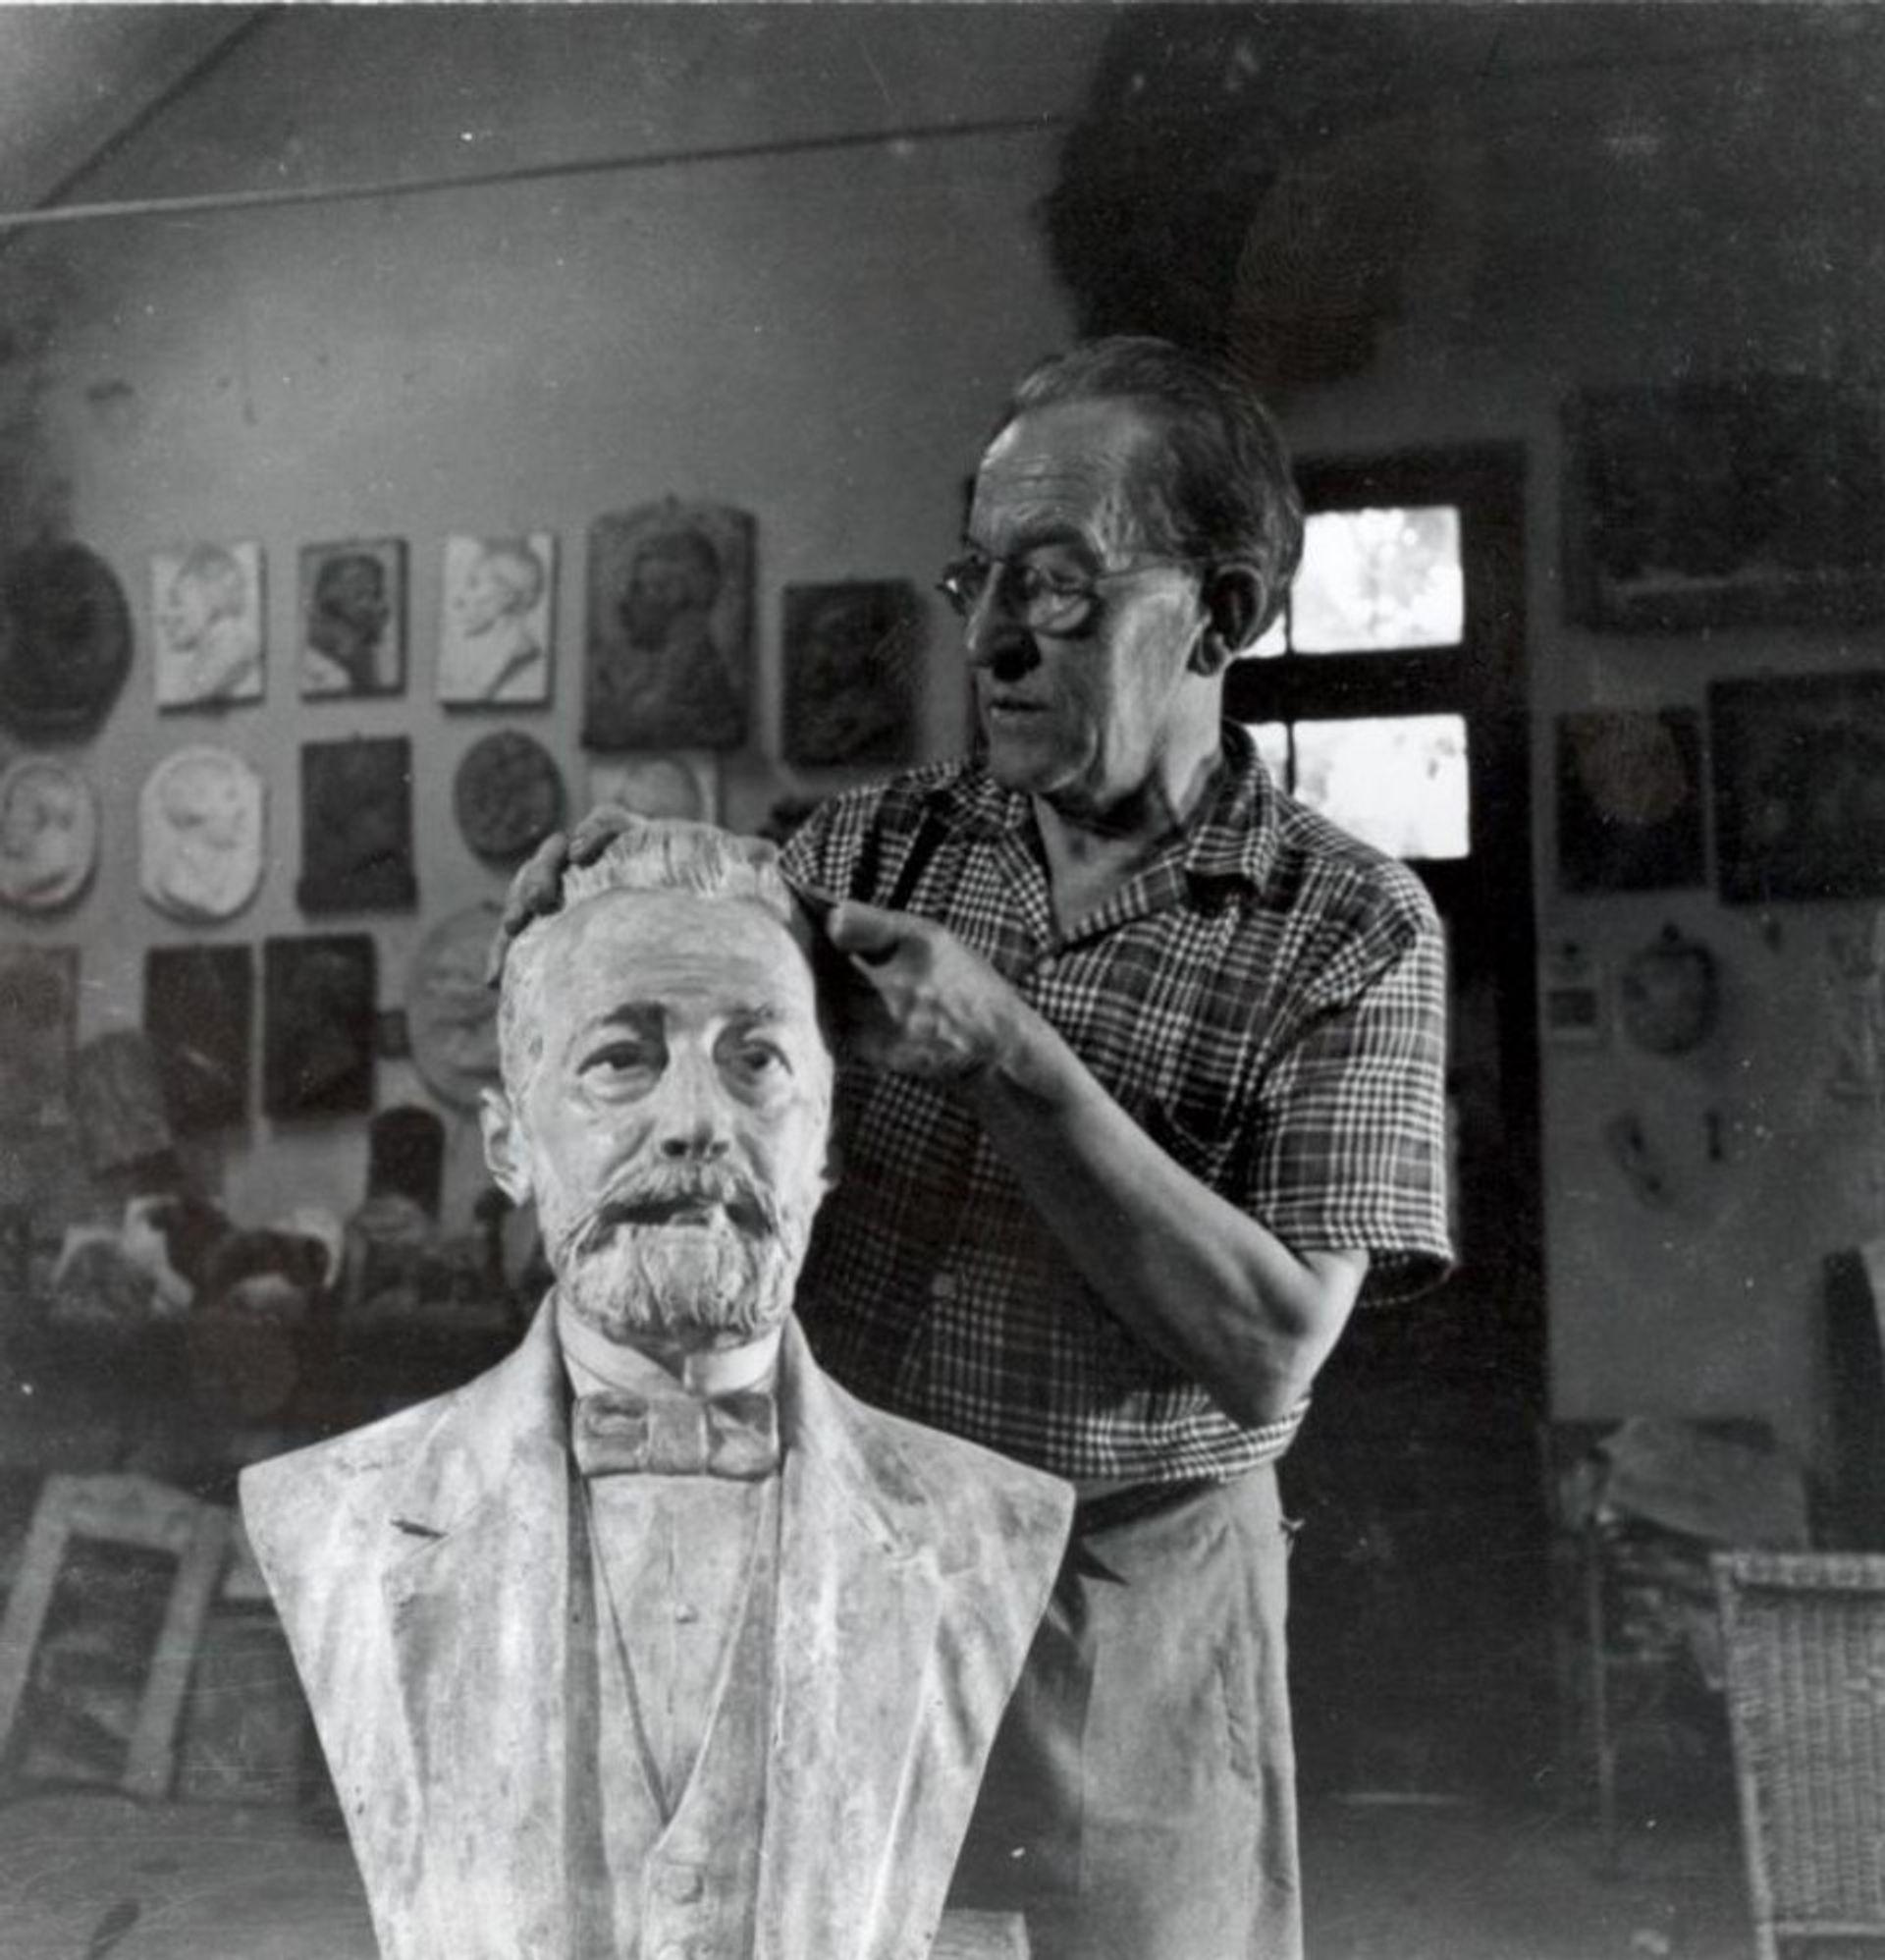 The Brazilian artist João Turin in his studio in Curitiba SSTP Investimentos Ltda